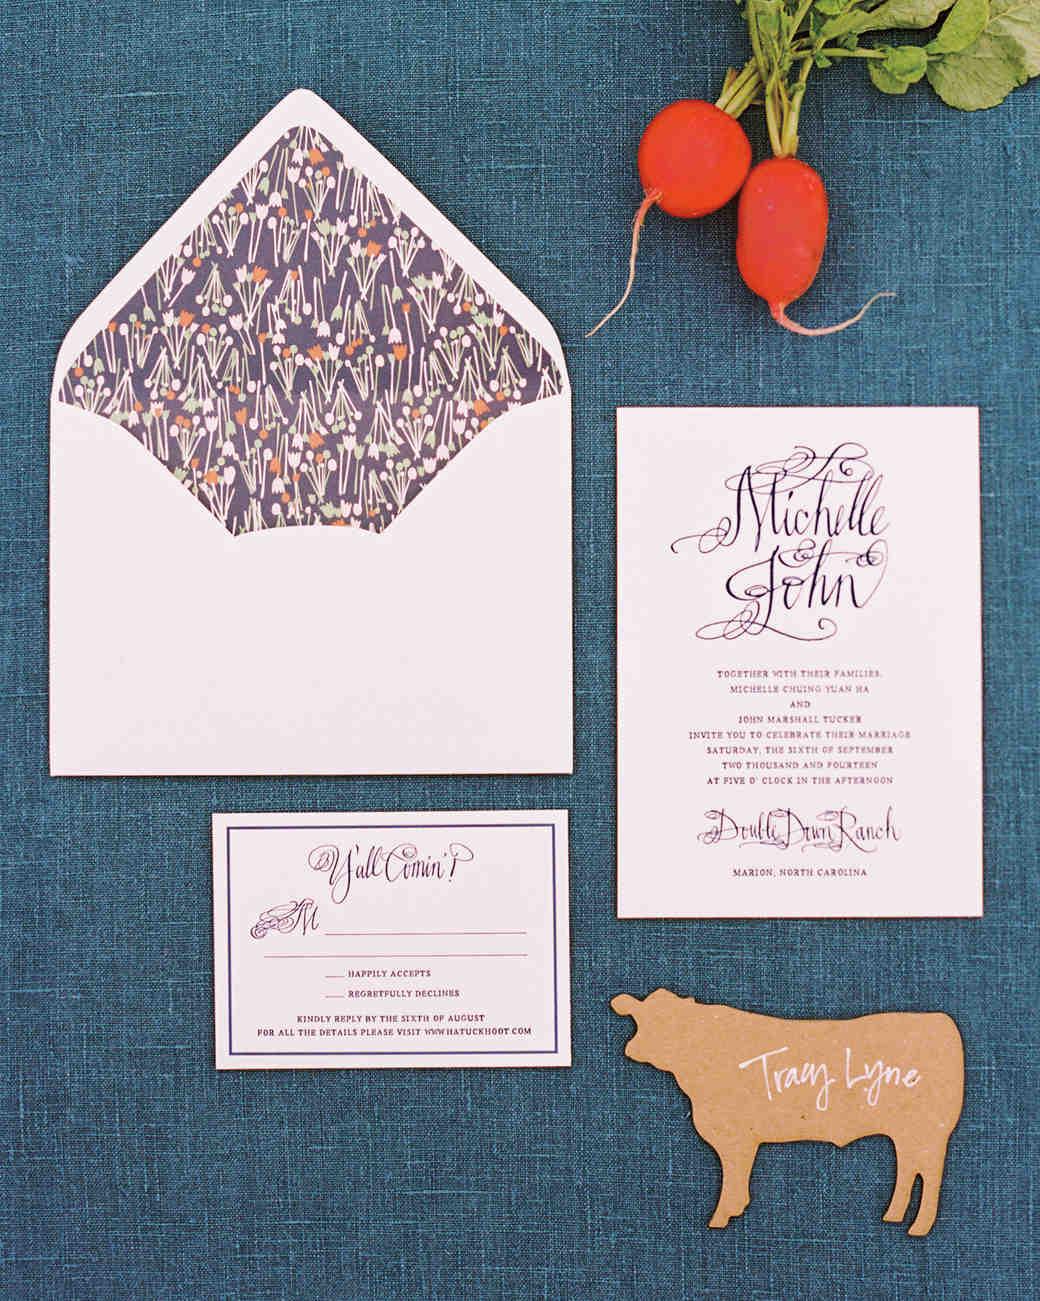 michelle-john-wedding-north-carolina-20-s111840.jpg